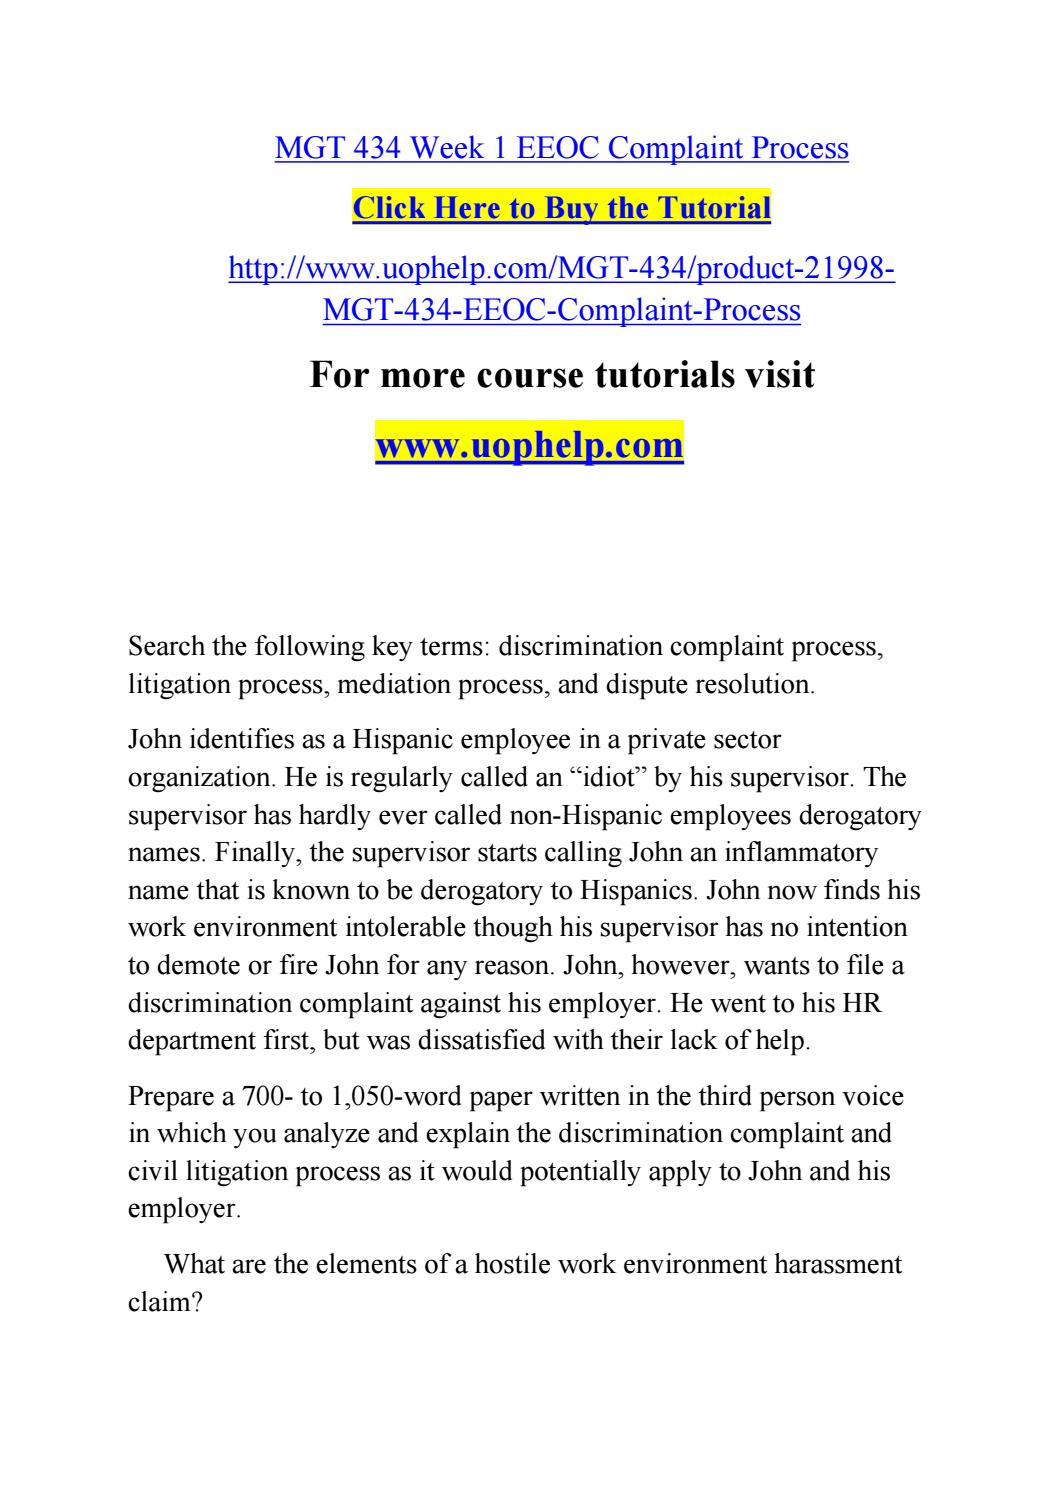 Mgt 434 week 1 eeoc complaint process by Lilium99 - issuu